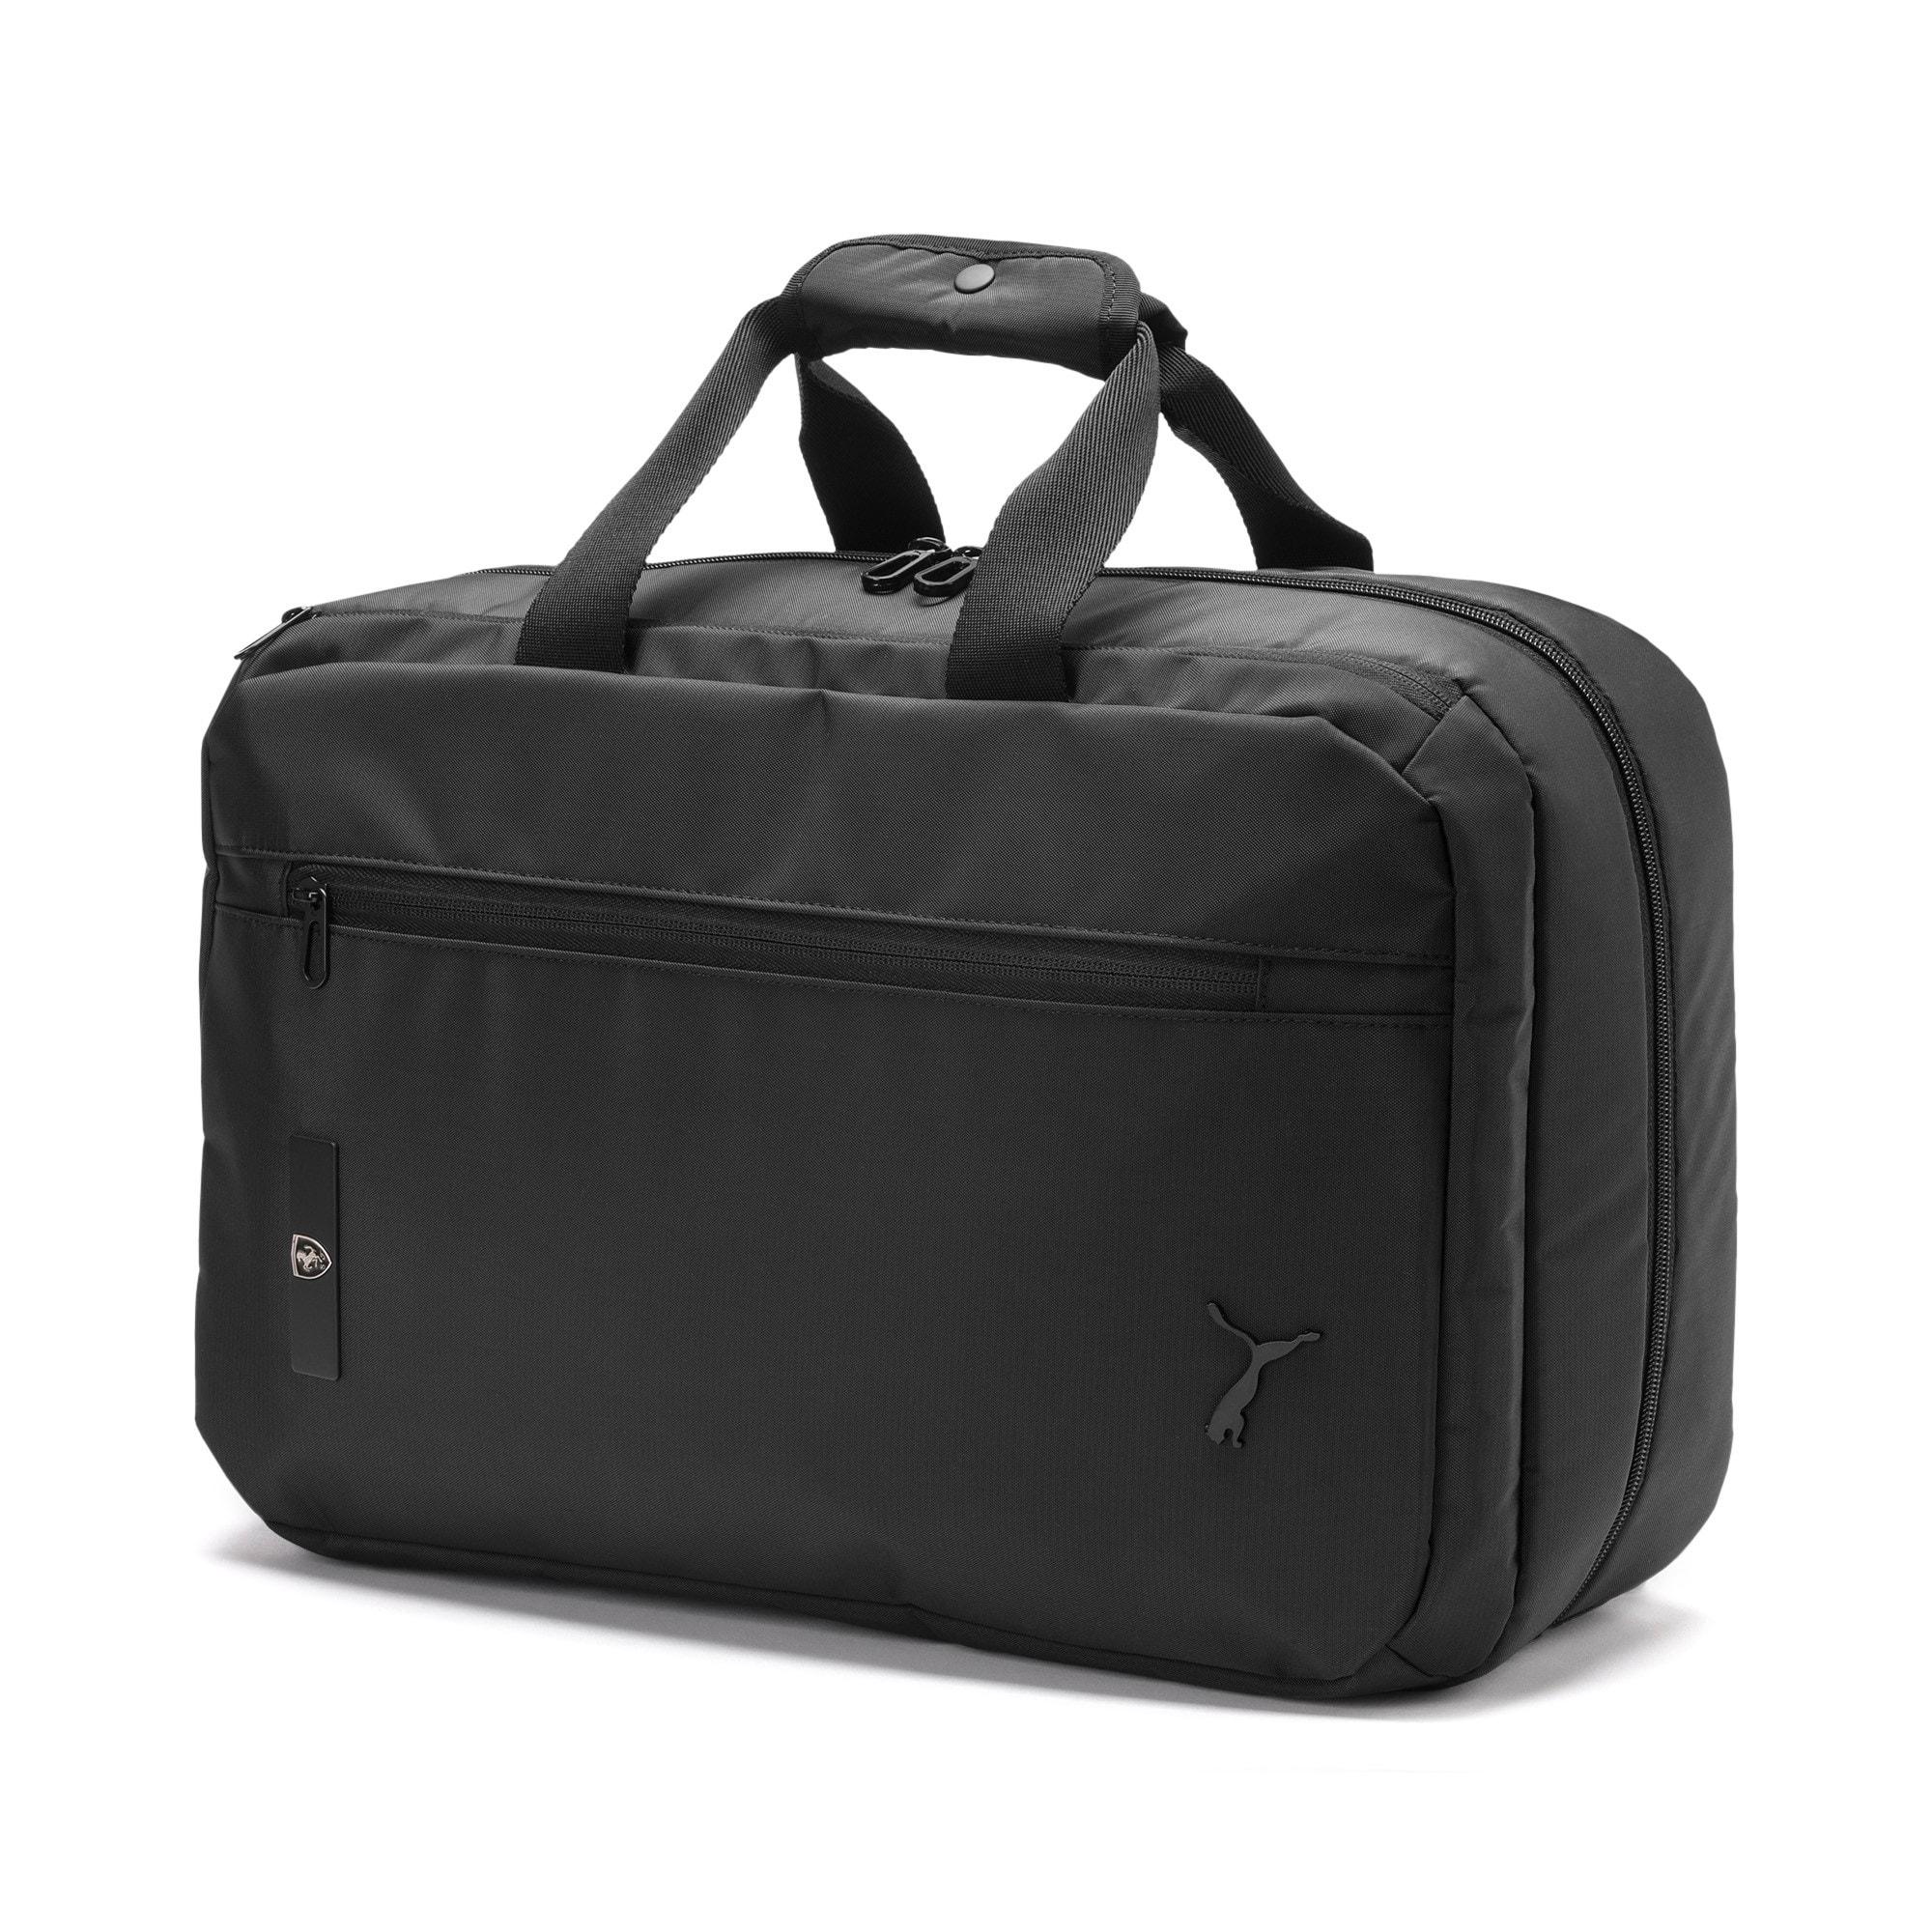 Thumbnail 3 of Ferrari Lifestyle RCT Backpack, Puma Black, medium-IND